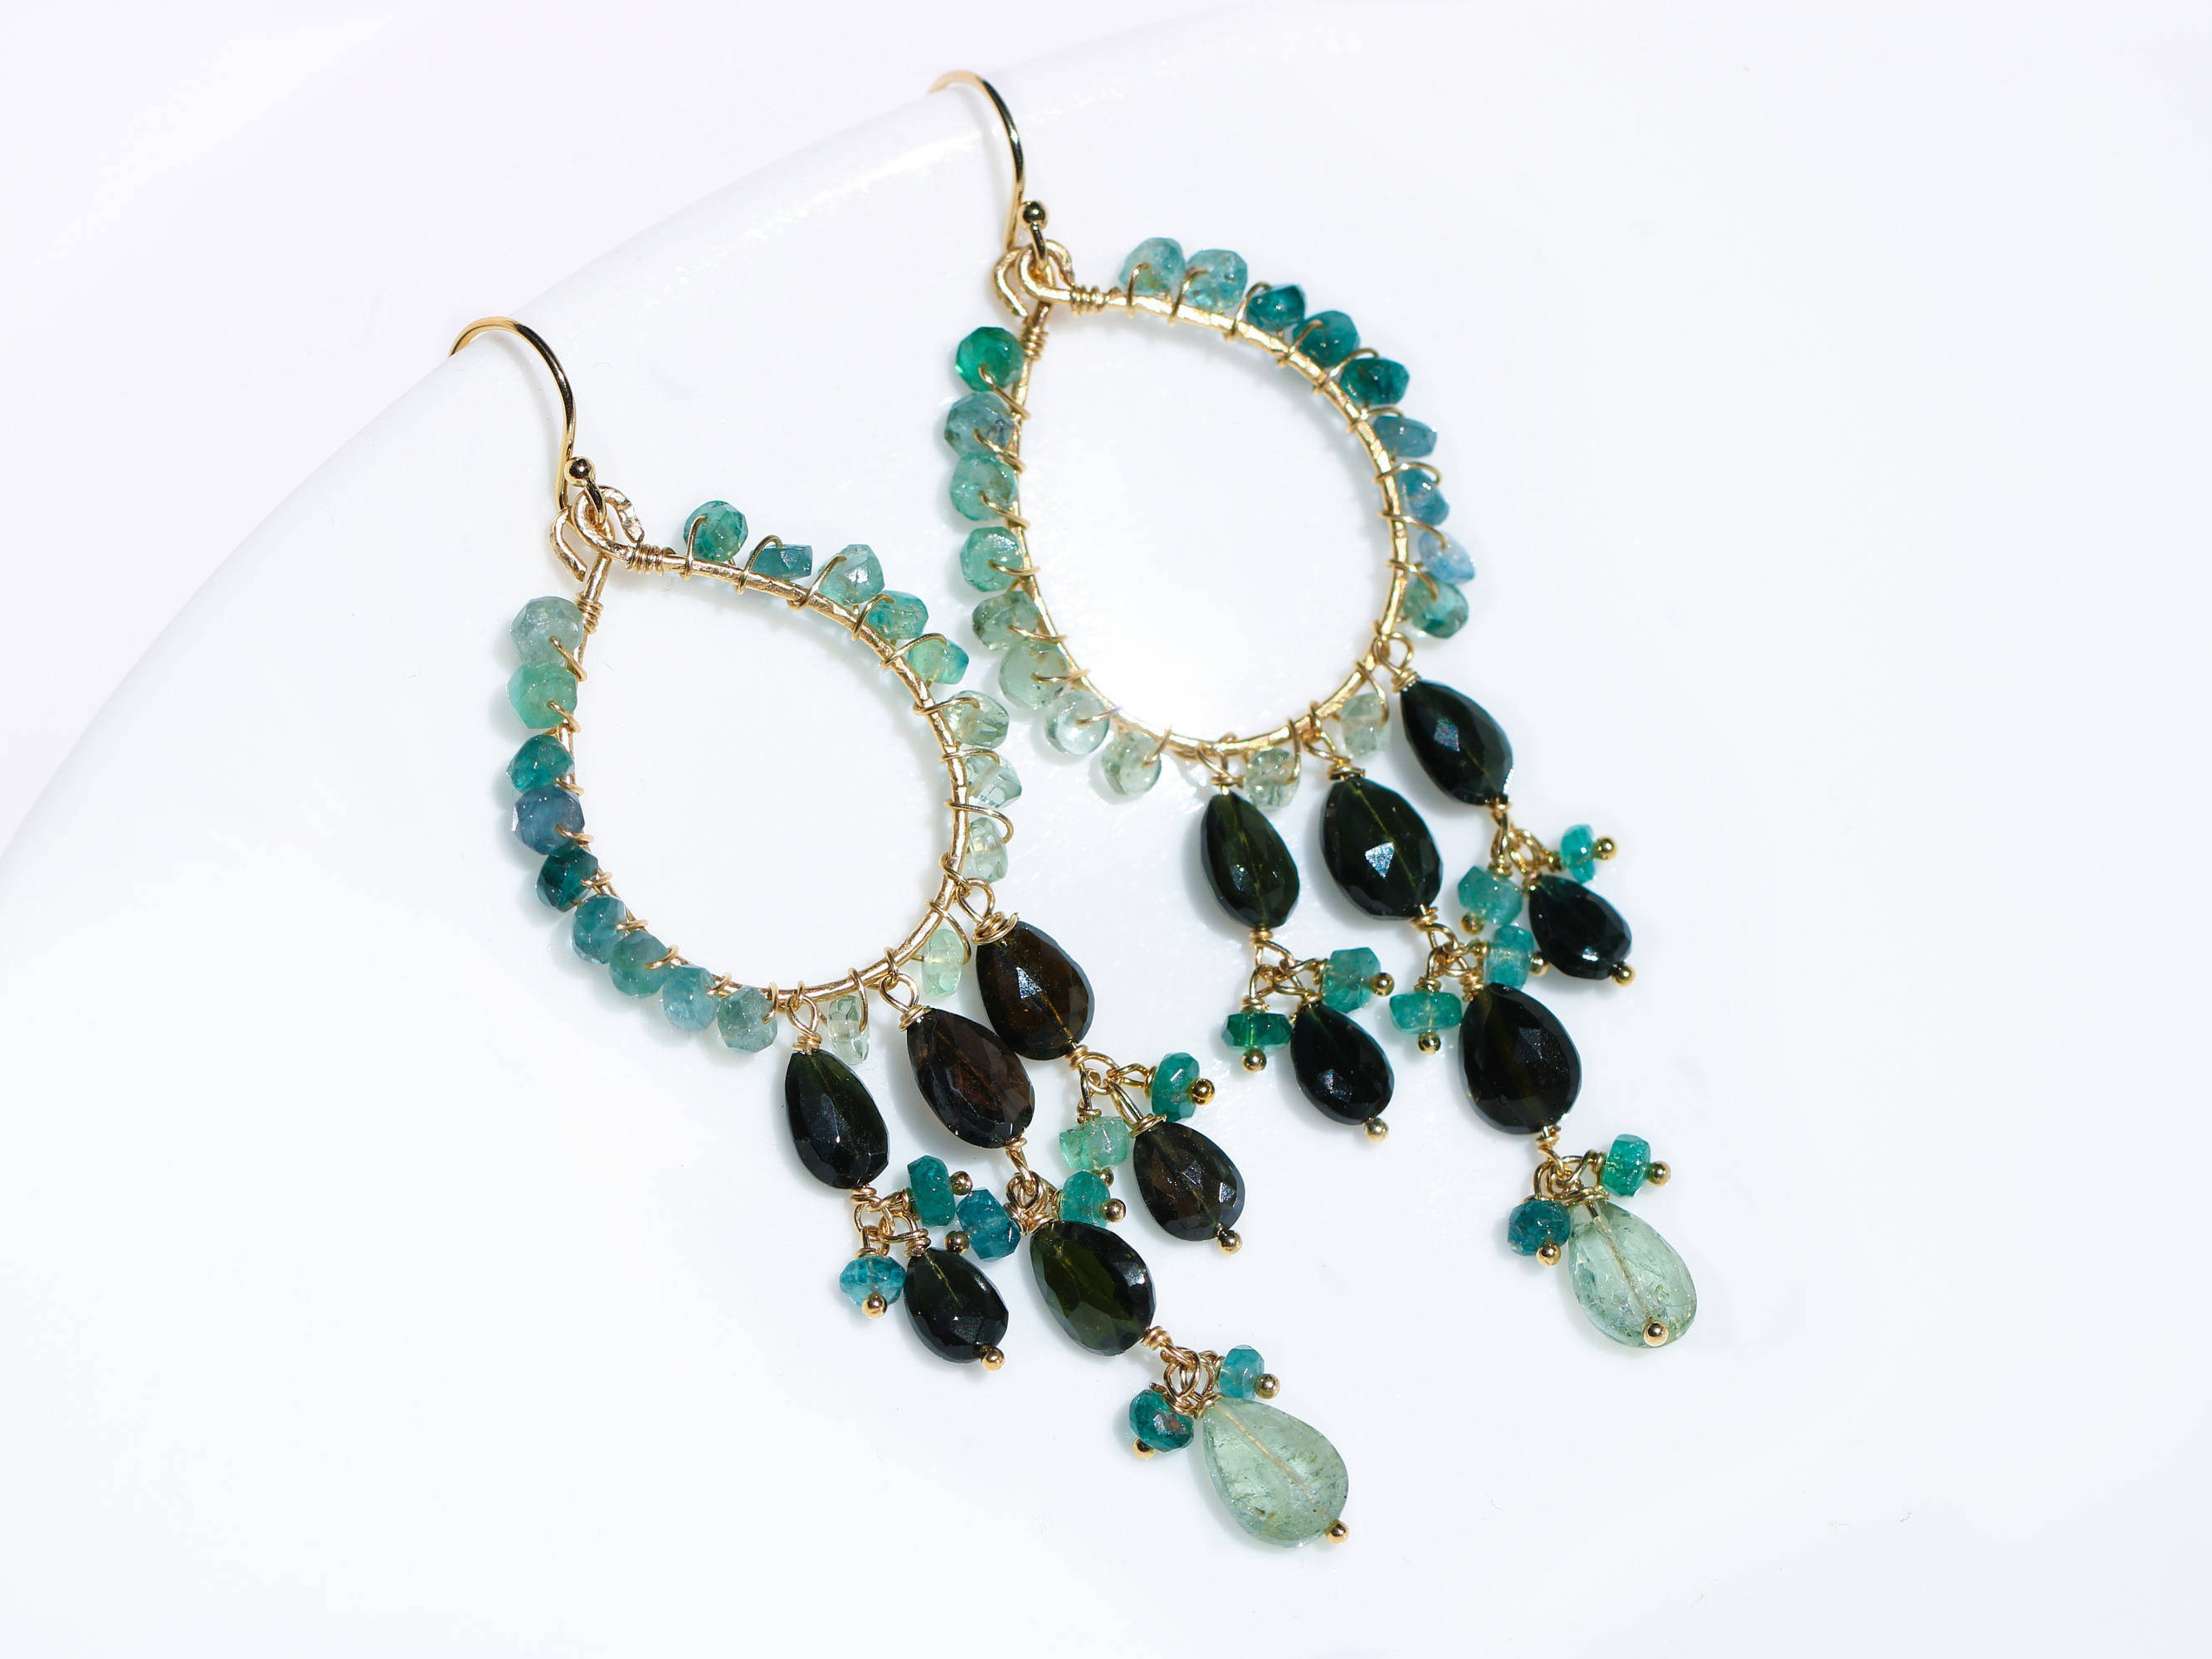 Blue Tourmaline and Black Tourmaline Chandelier Earrings